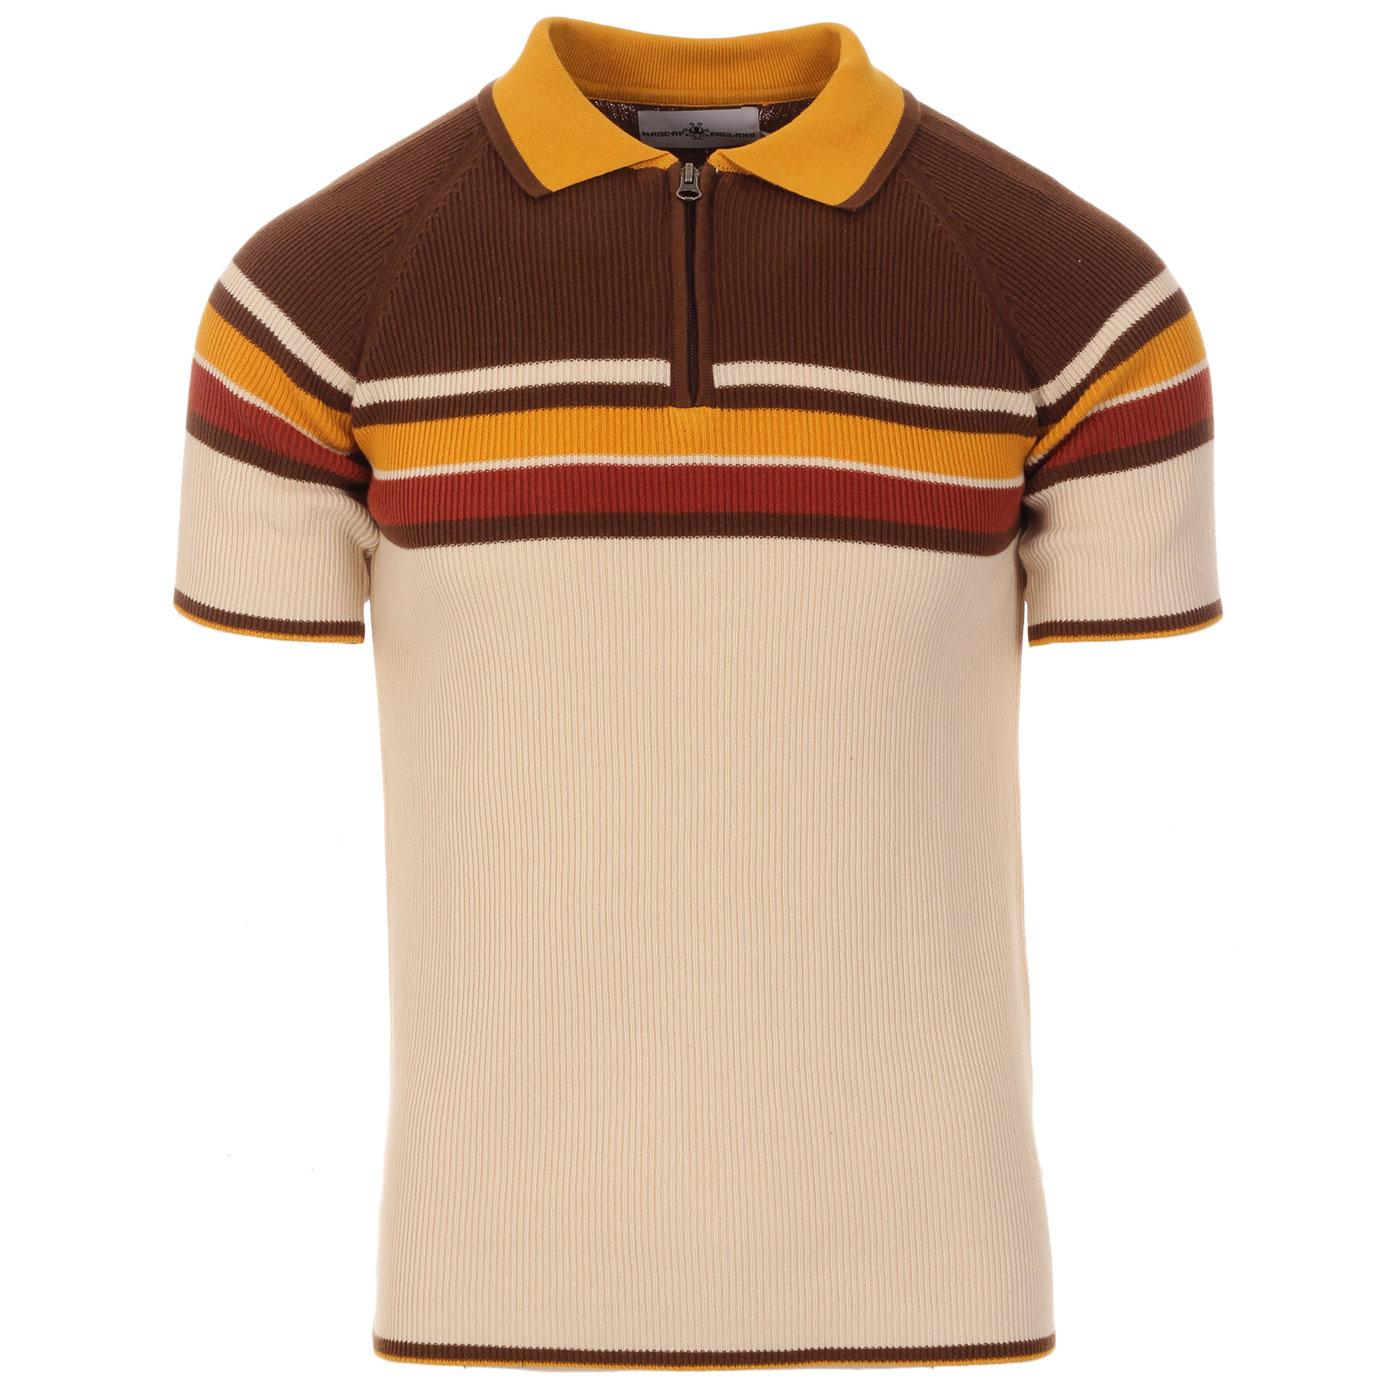 Madcap England Meteor Retro 70s Mod Ribbed Stripe Panel Polo Shirt in Birch